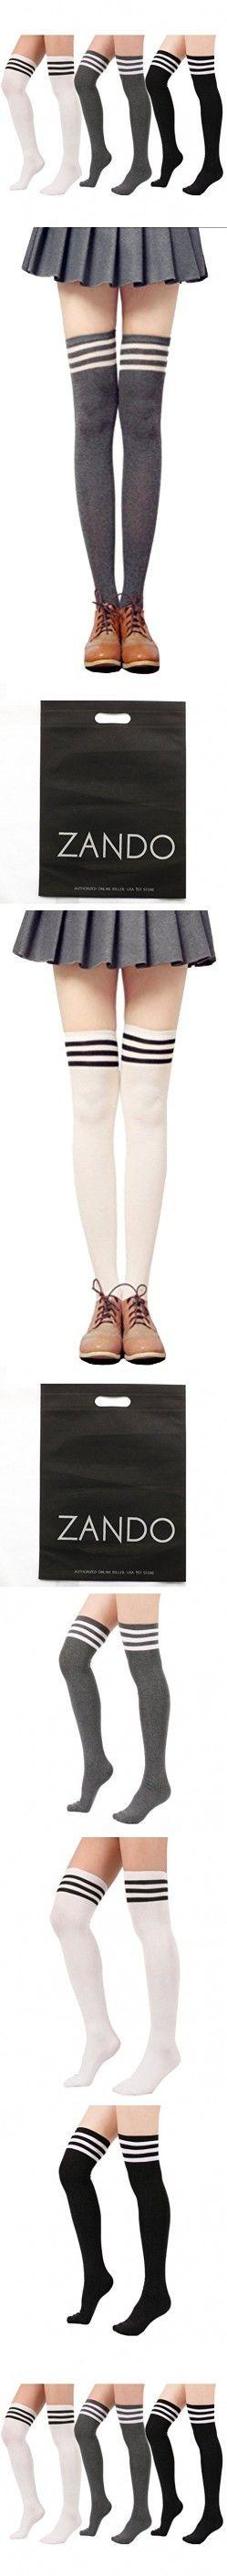 Zando Women Stripe Tube Dresses Over the Knee Thigh High Stockings Cosplay Socks 3Pairs White w Black w Gray